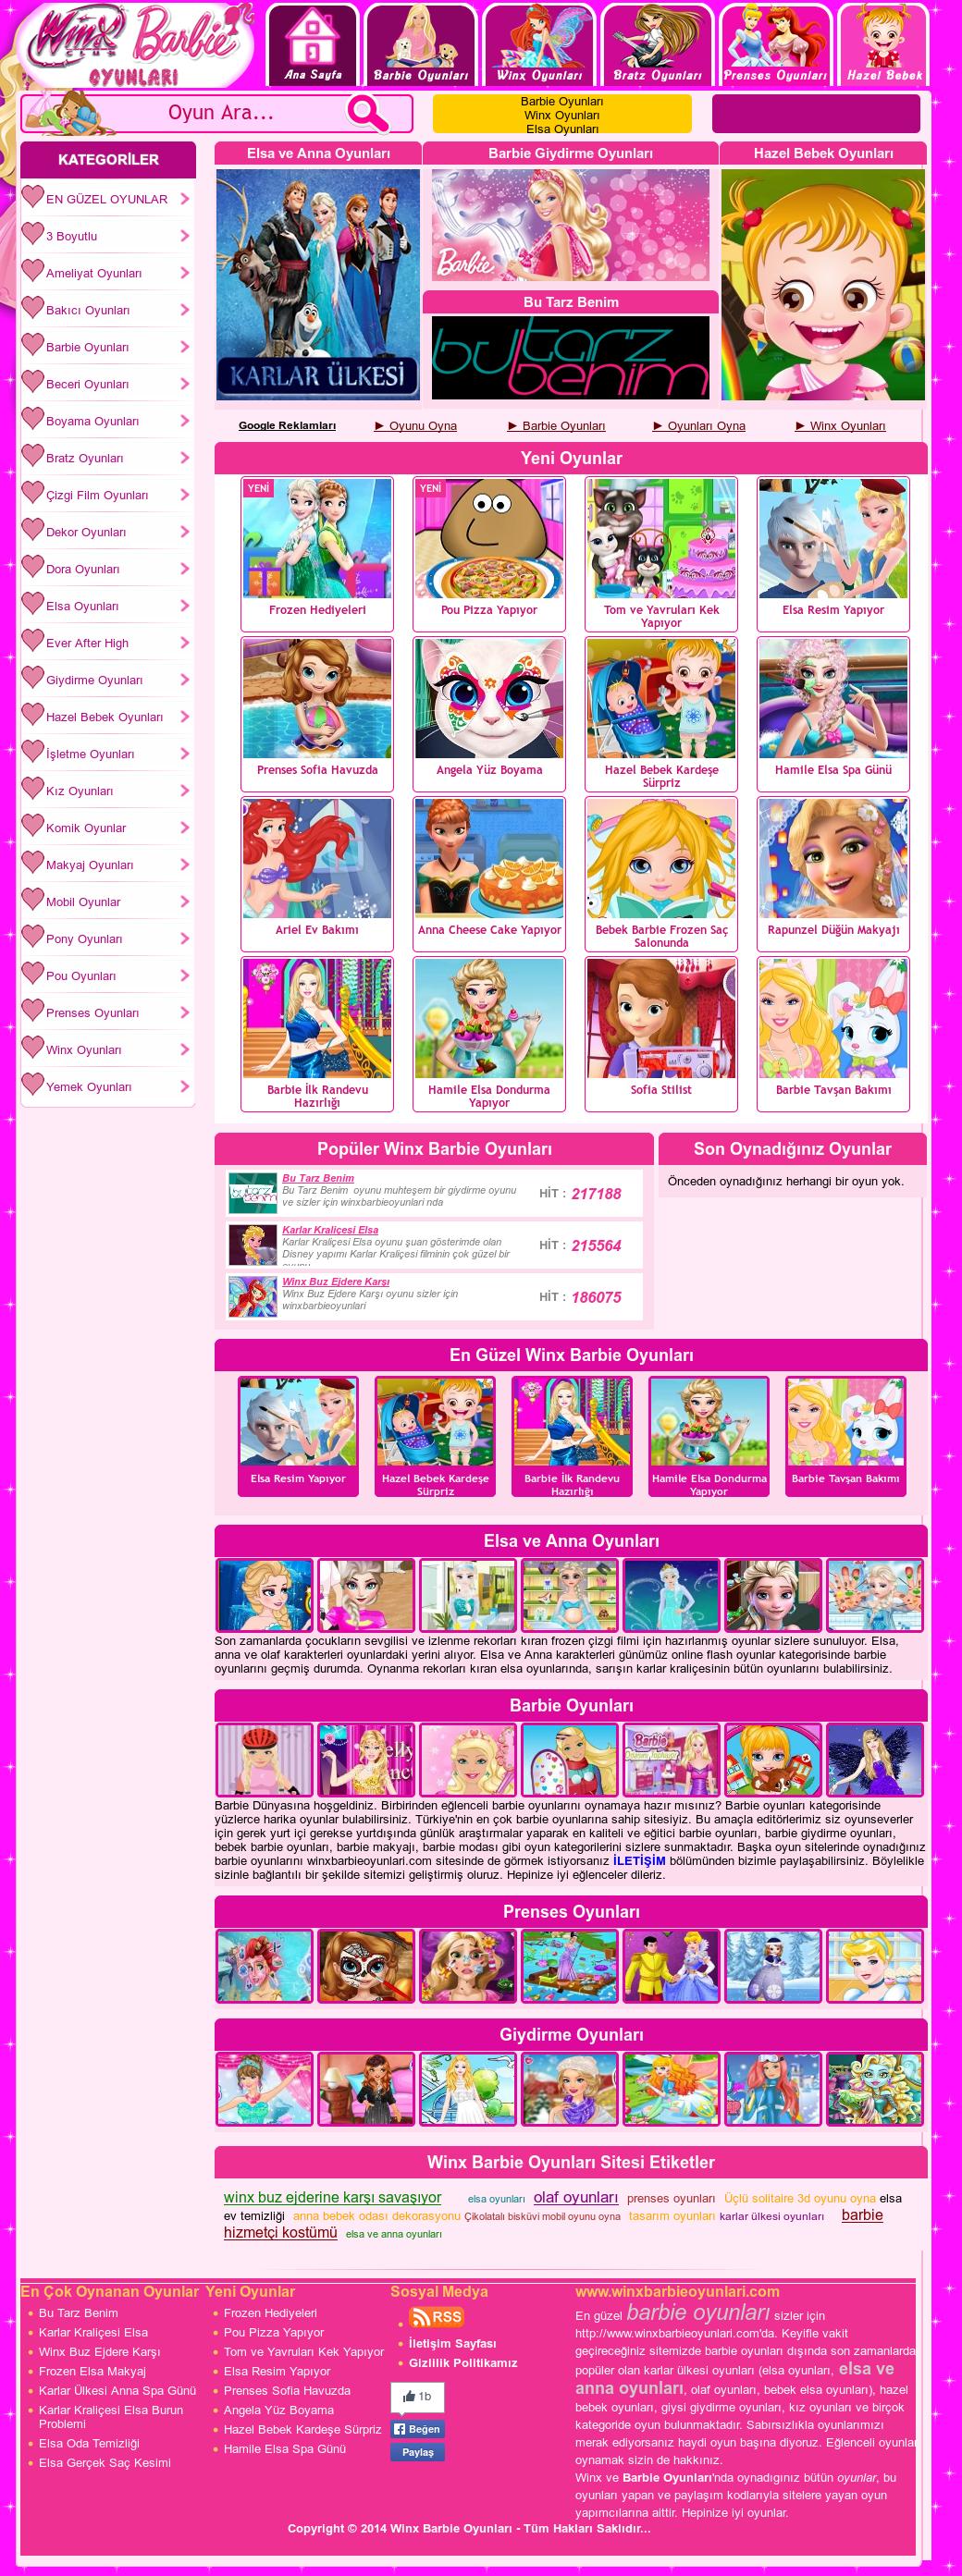 Winx Barbie Oyunlari Competitors Revenue And Employees Owler